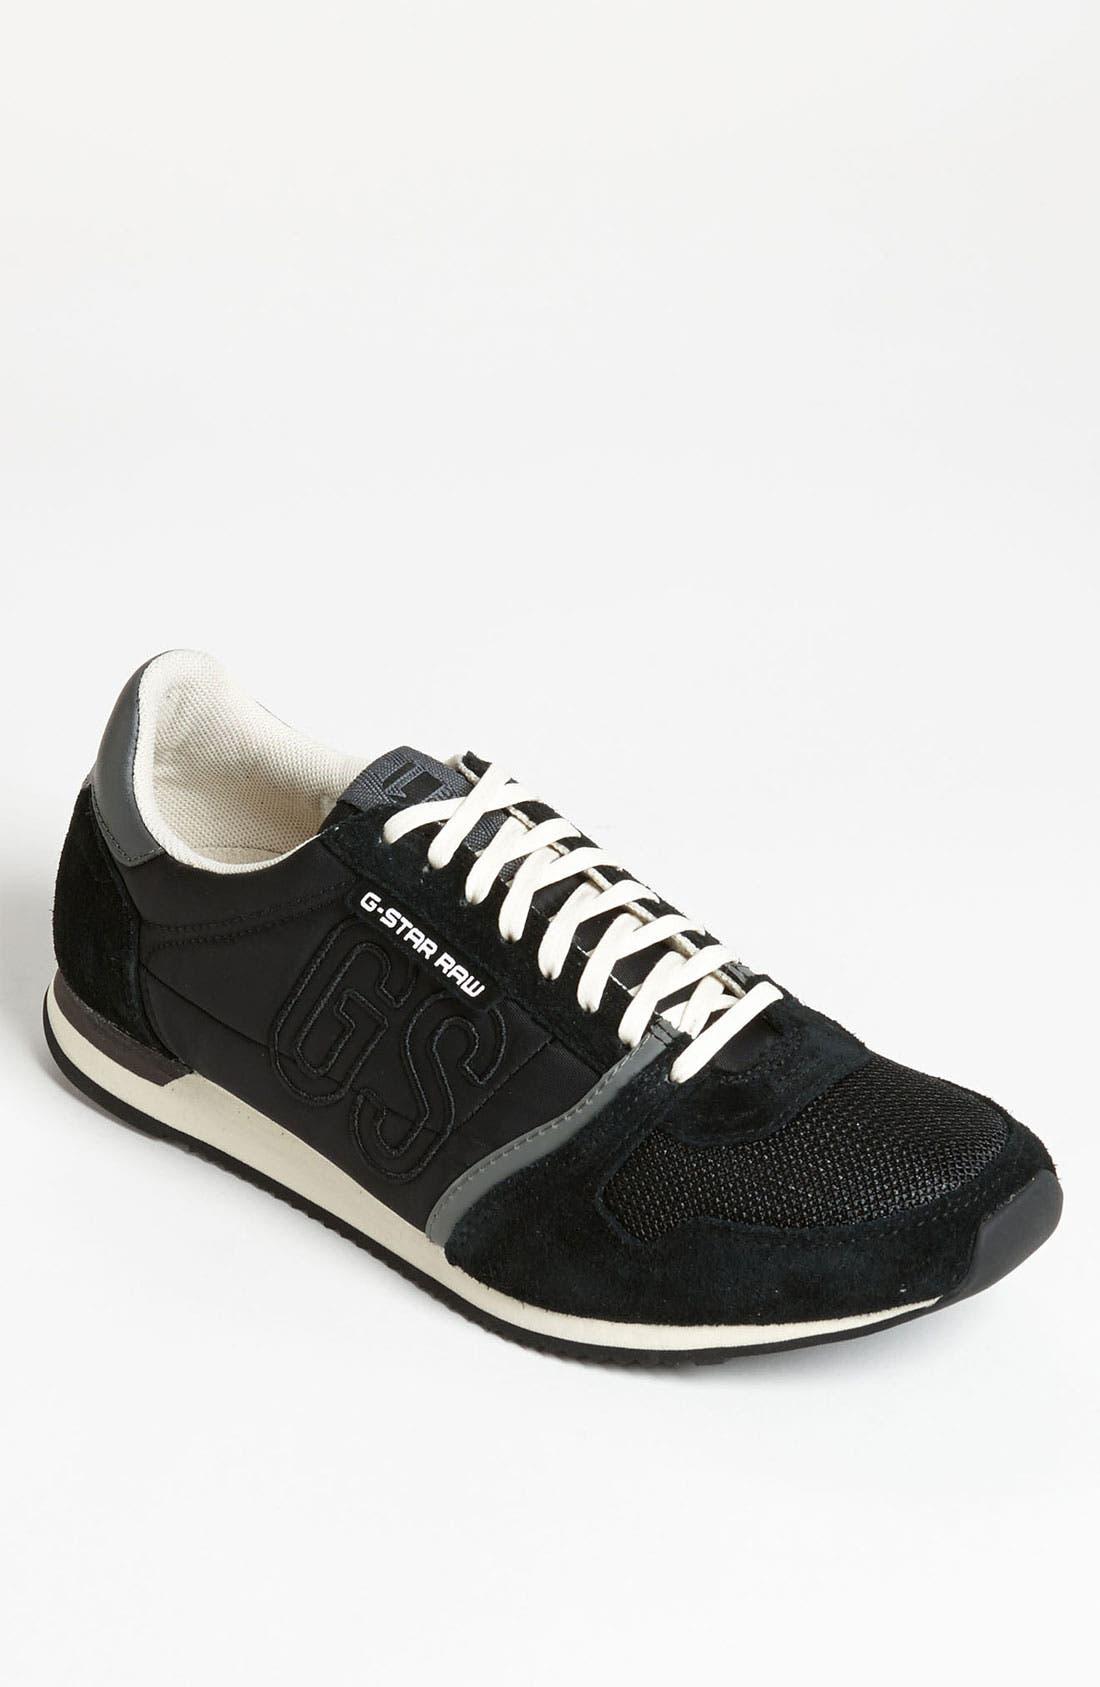 Alternate Image 1 Selected - G-Star Raw 'Track Futura' Sneaker (Men)